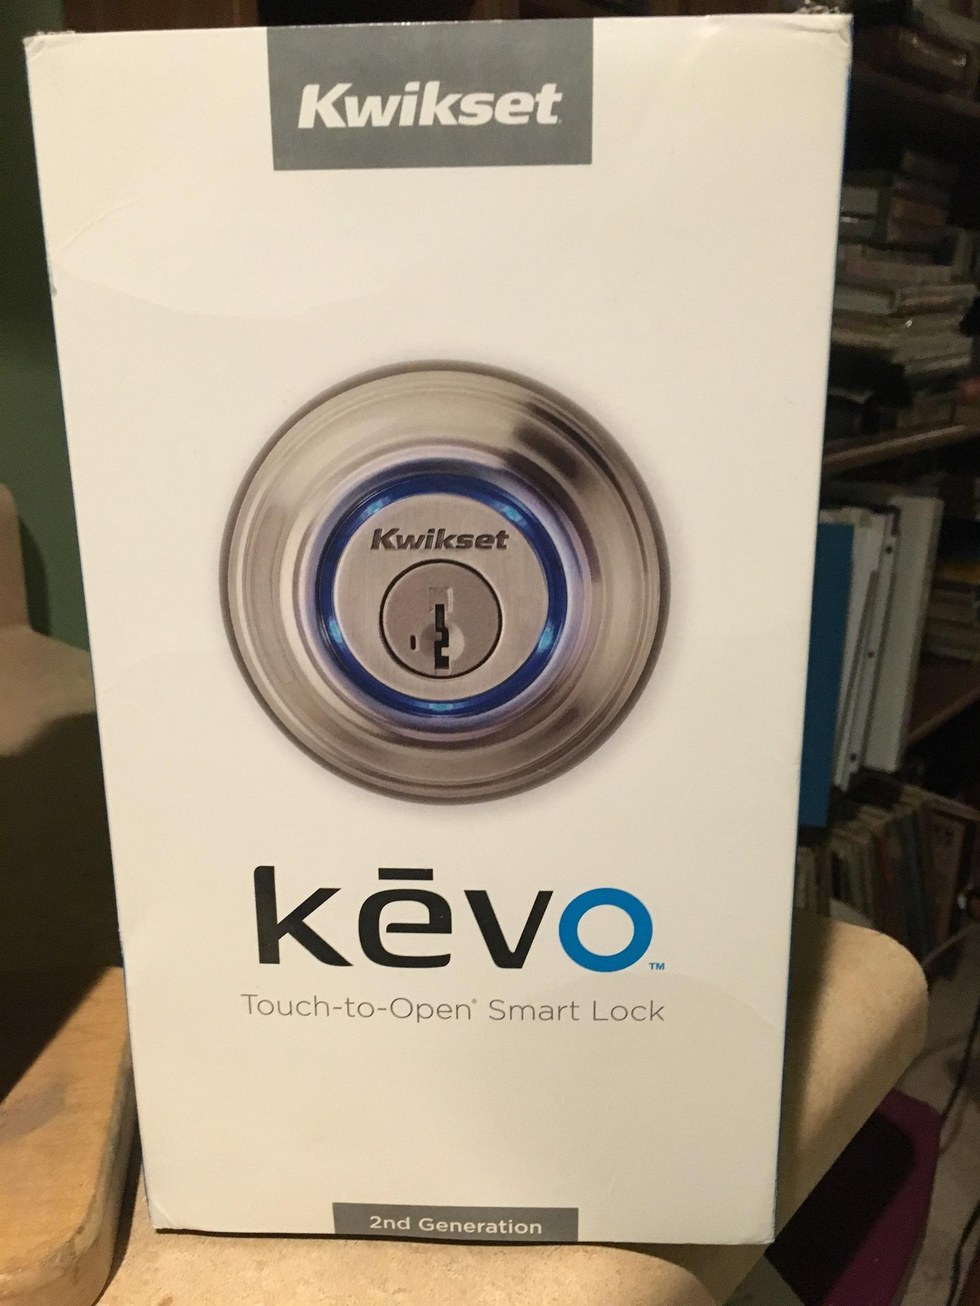 Installing Kevo Smart Lock